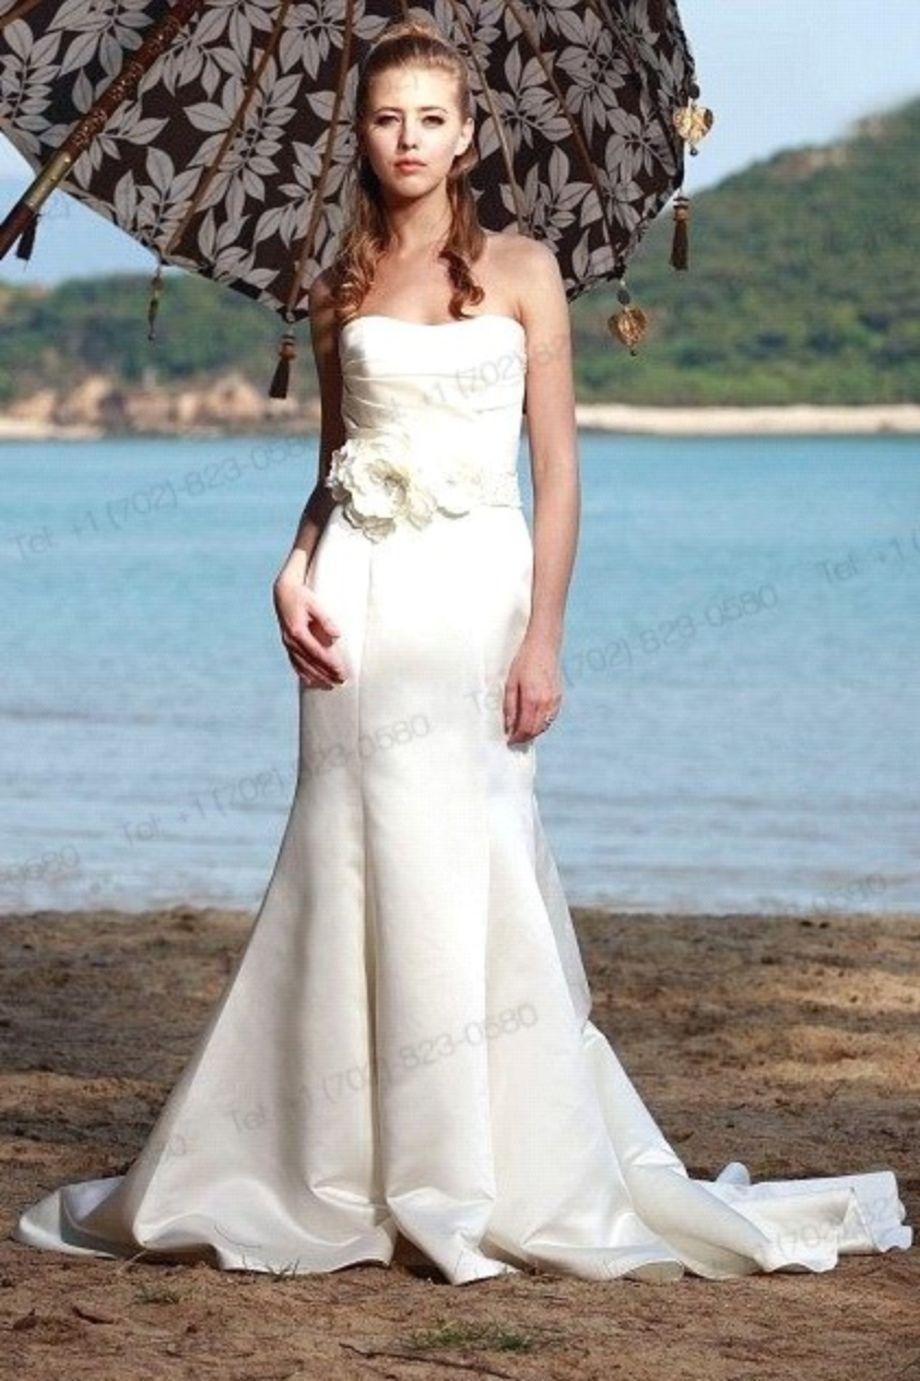 89 Stylish Courthouse Wedding Dress Ideas   Dress ideas, Las vegas ...